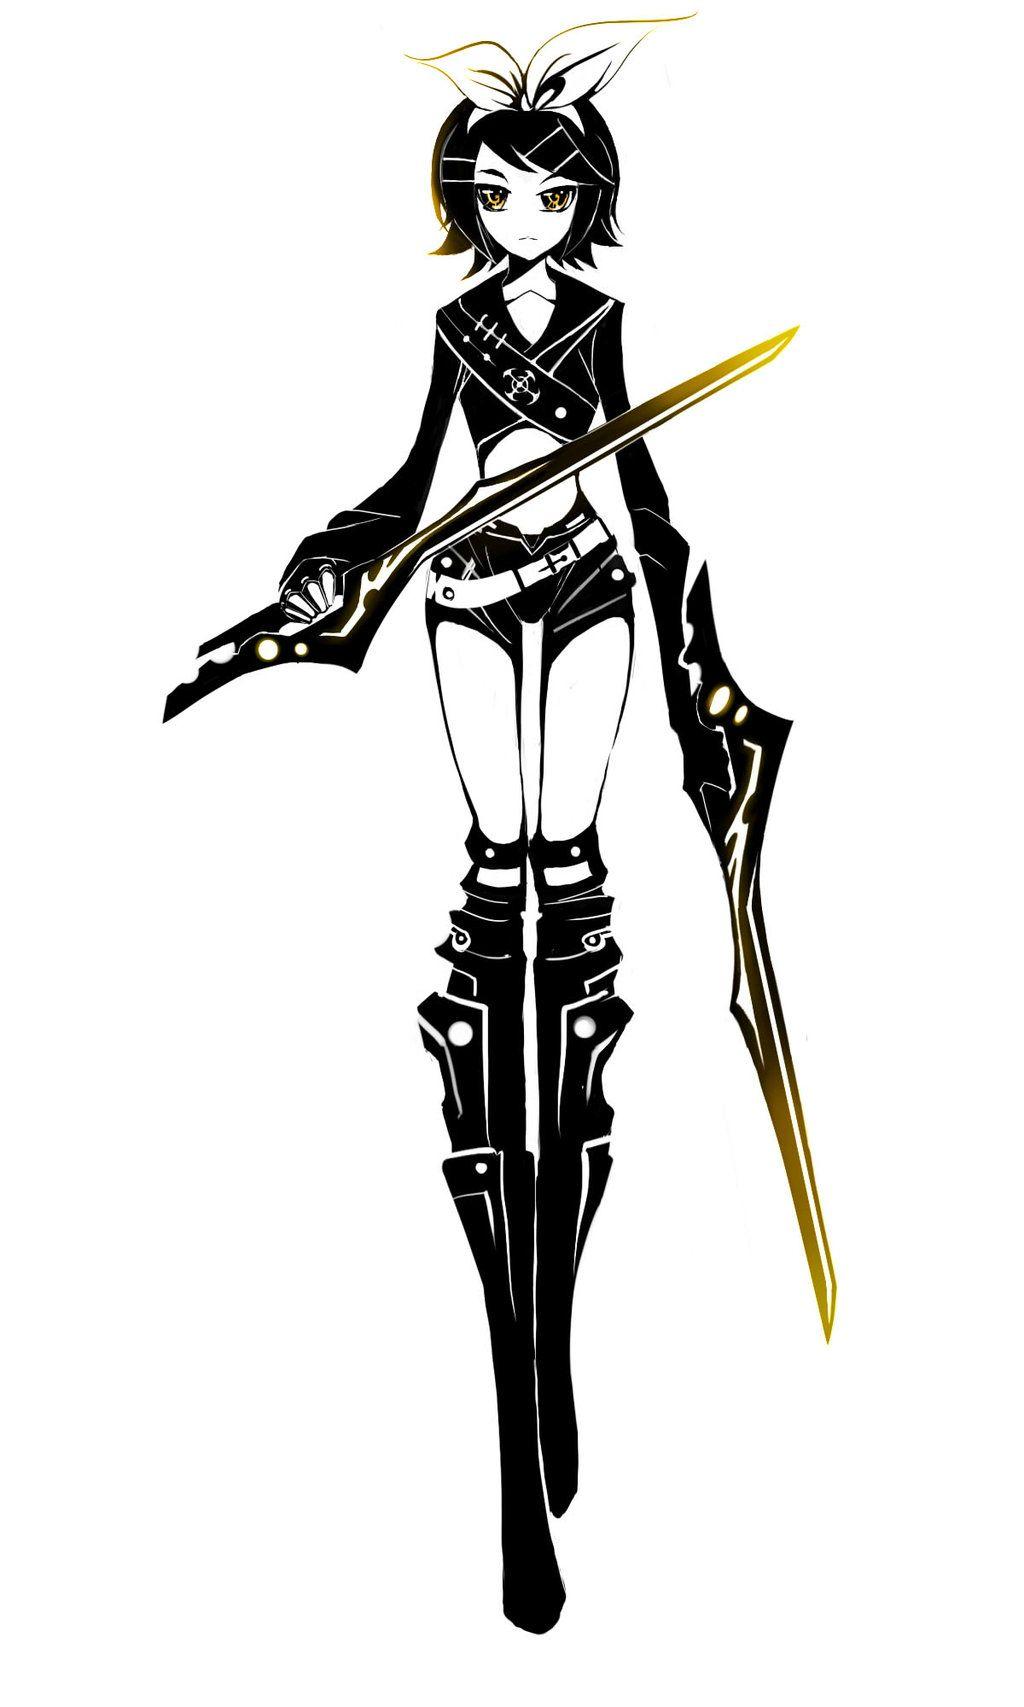 Ppc Ninja Assassin Kagamine Rin By Zephyravirgox On Deviantart Menina Anime Anime Ilustracao De Mangas